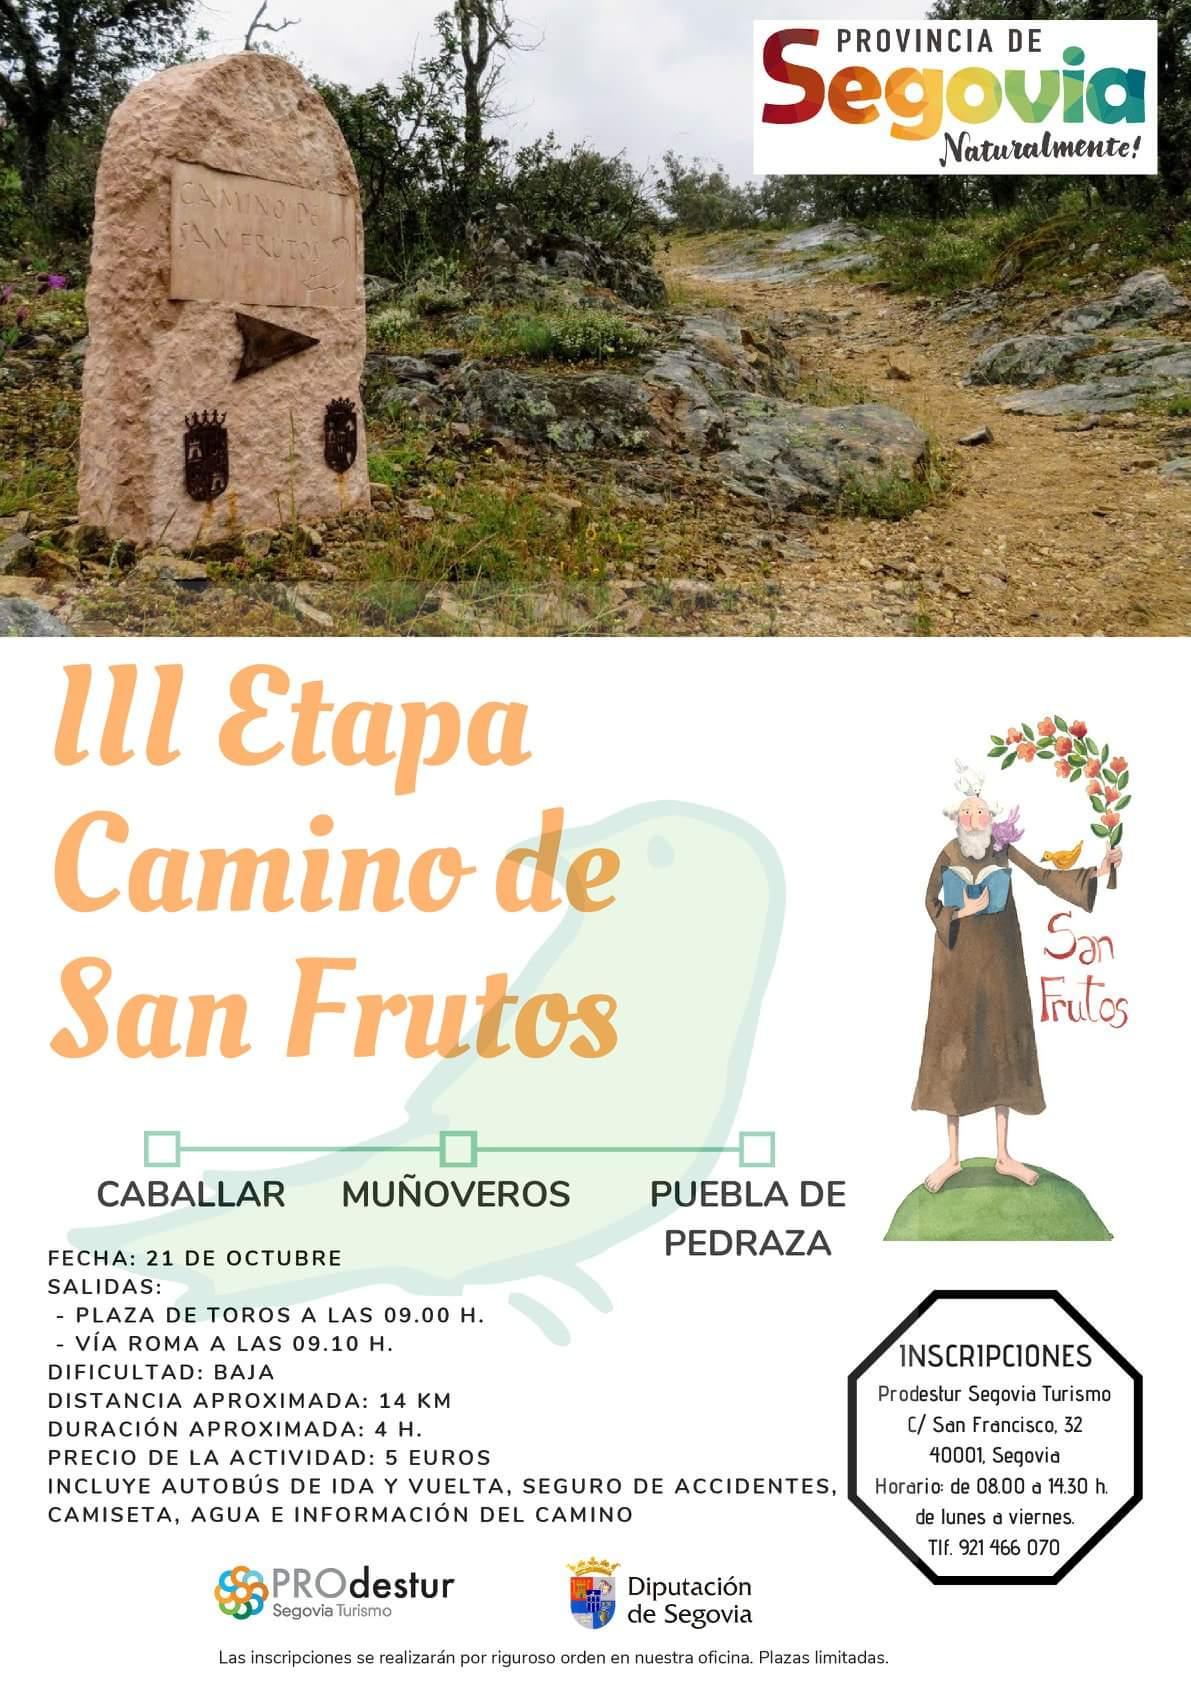 Camino de San Frutos Segovia